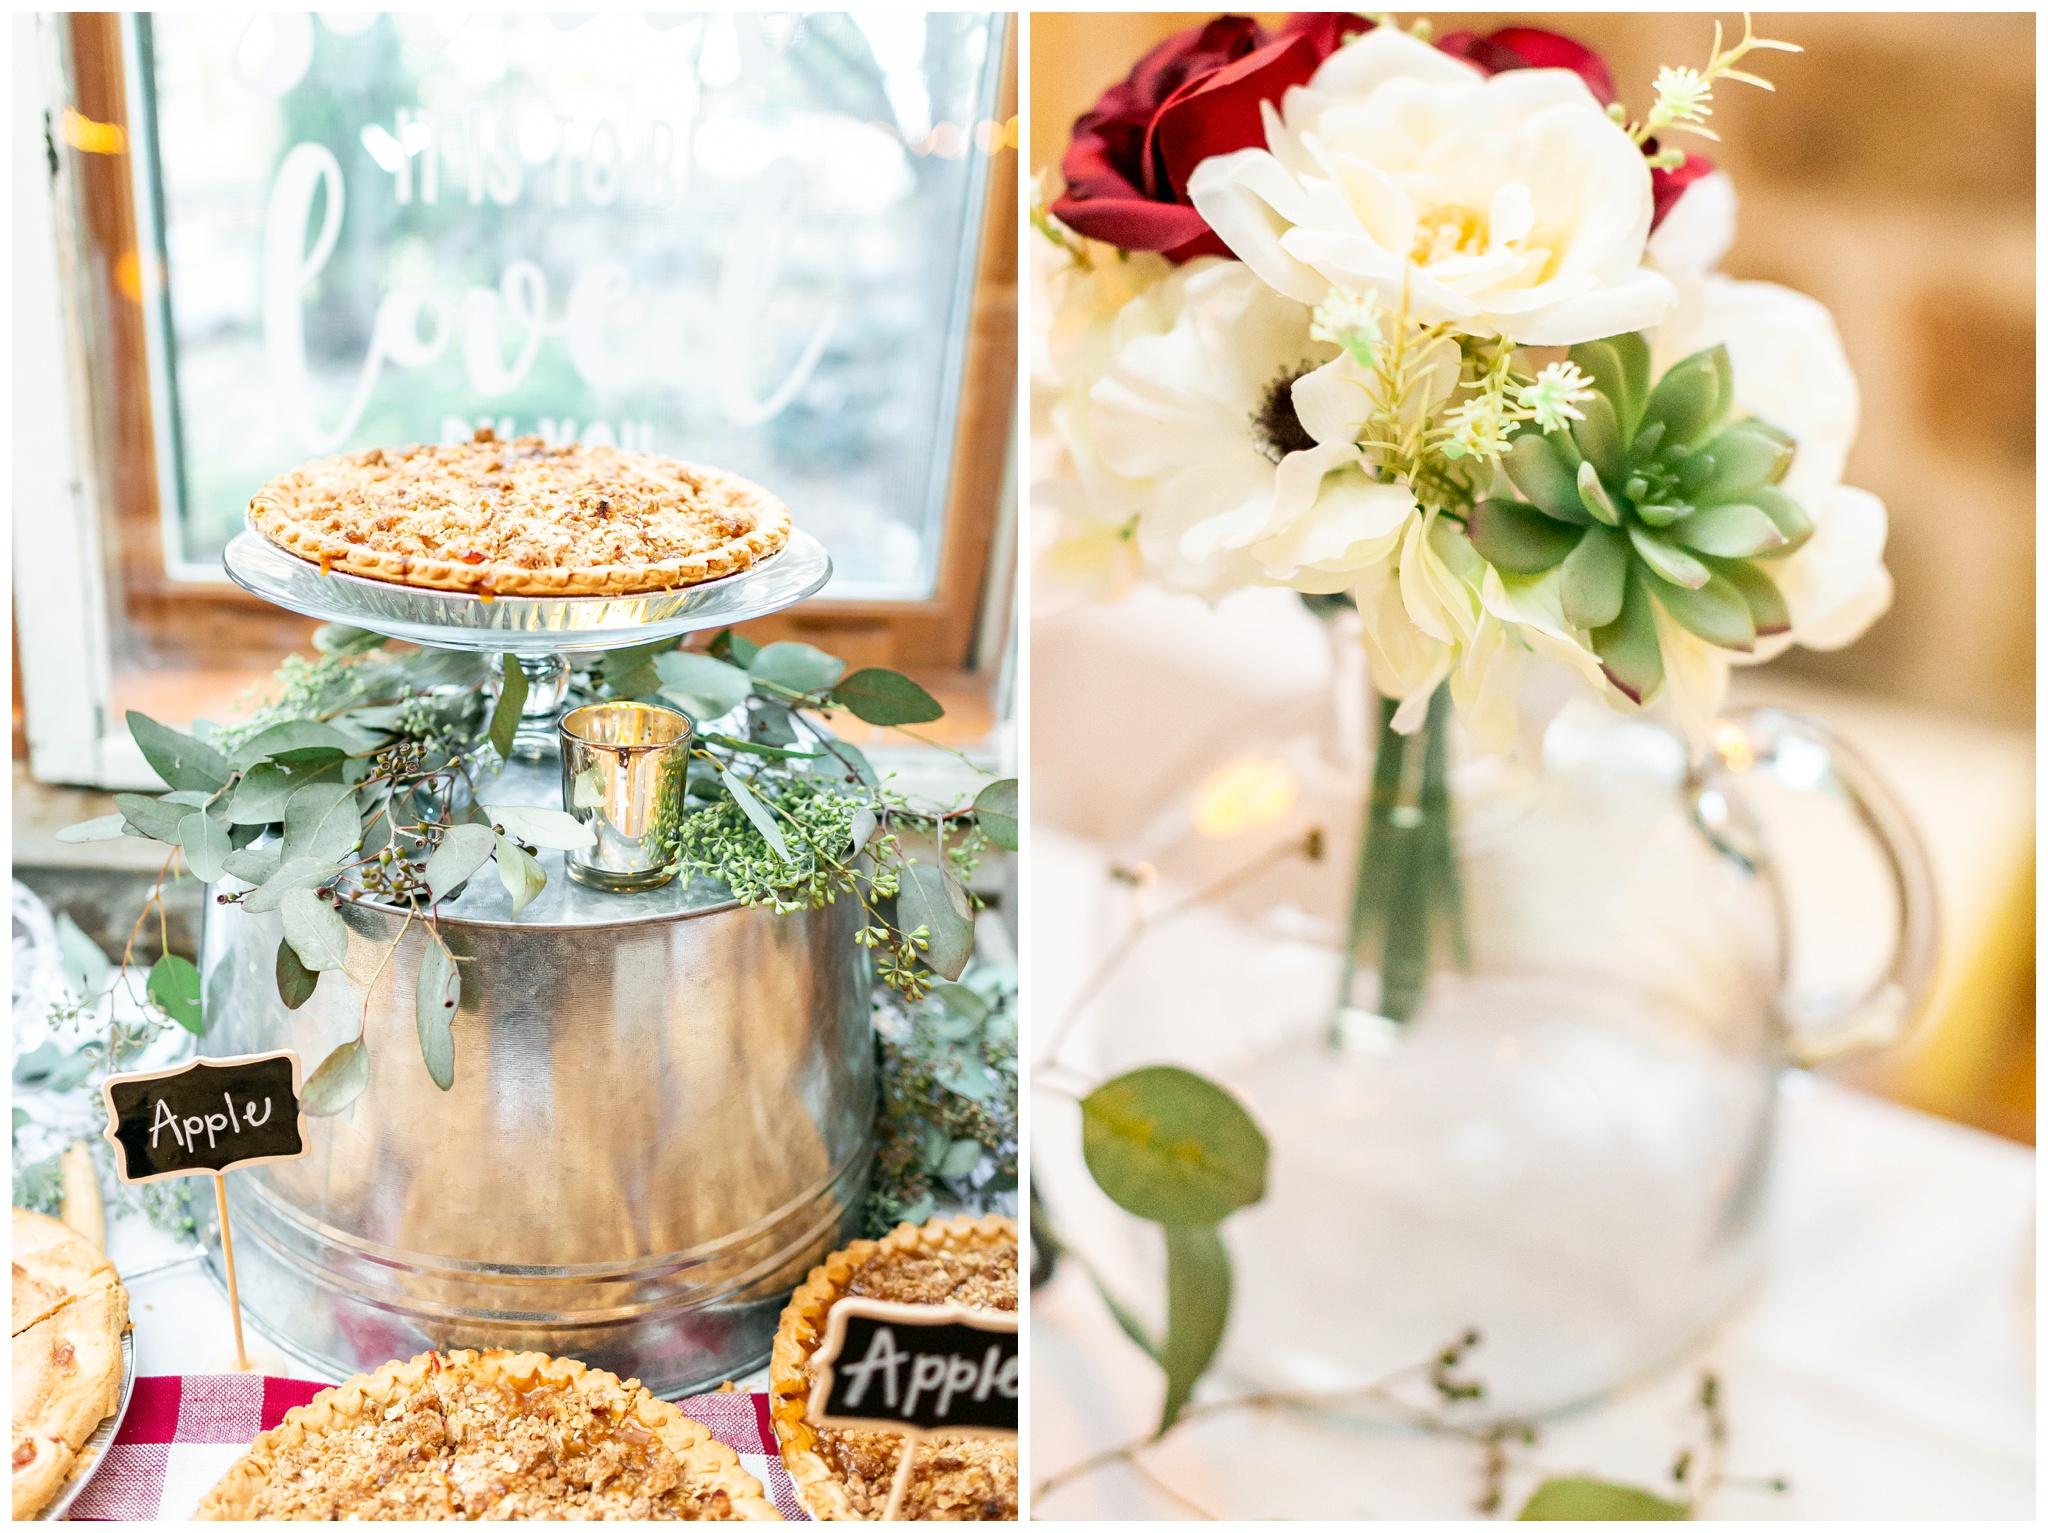 Shawano_County_park_Wedding_Caynay_Photo_Madison_Wi_2340.jpg